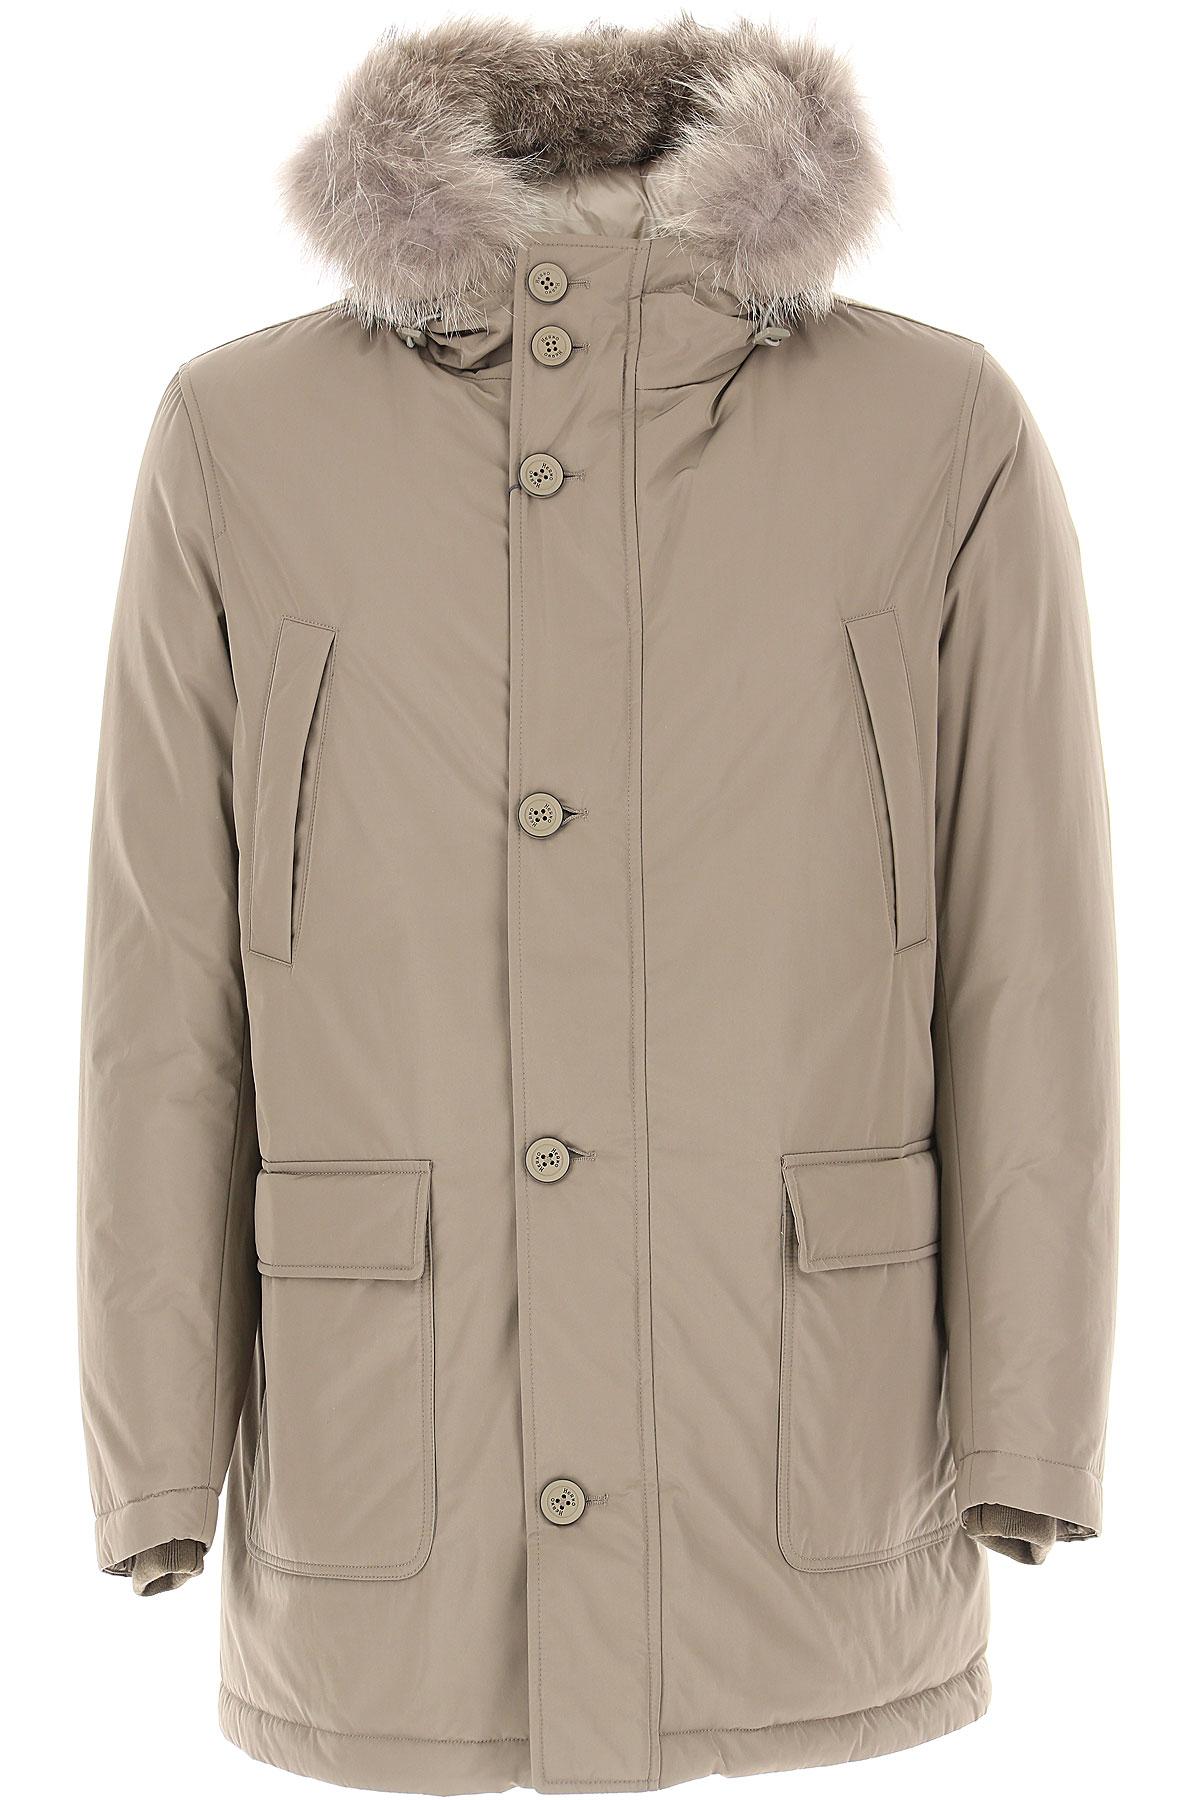 Herno Down Jacket for Men, Puffer Ski Jacket On Sale, Beige, Down, 2019, L XL